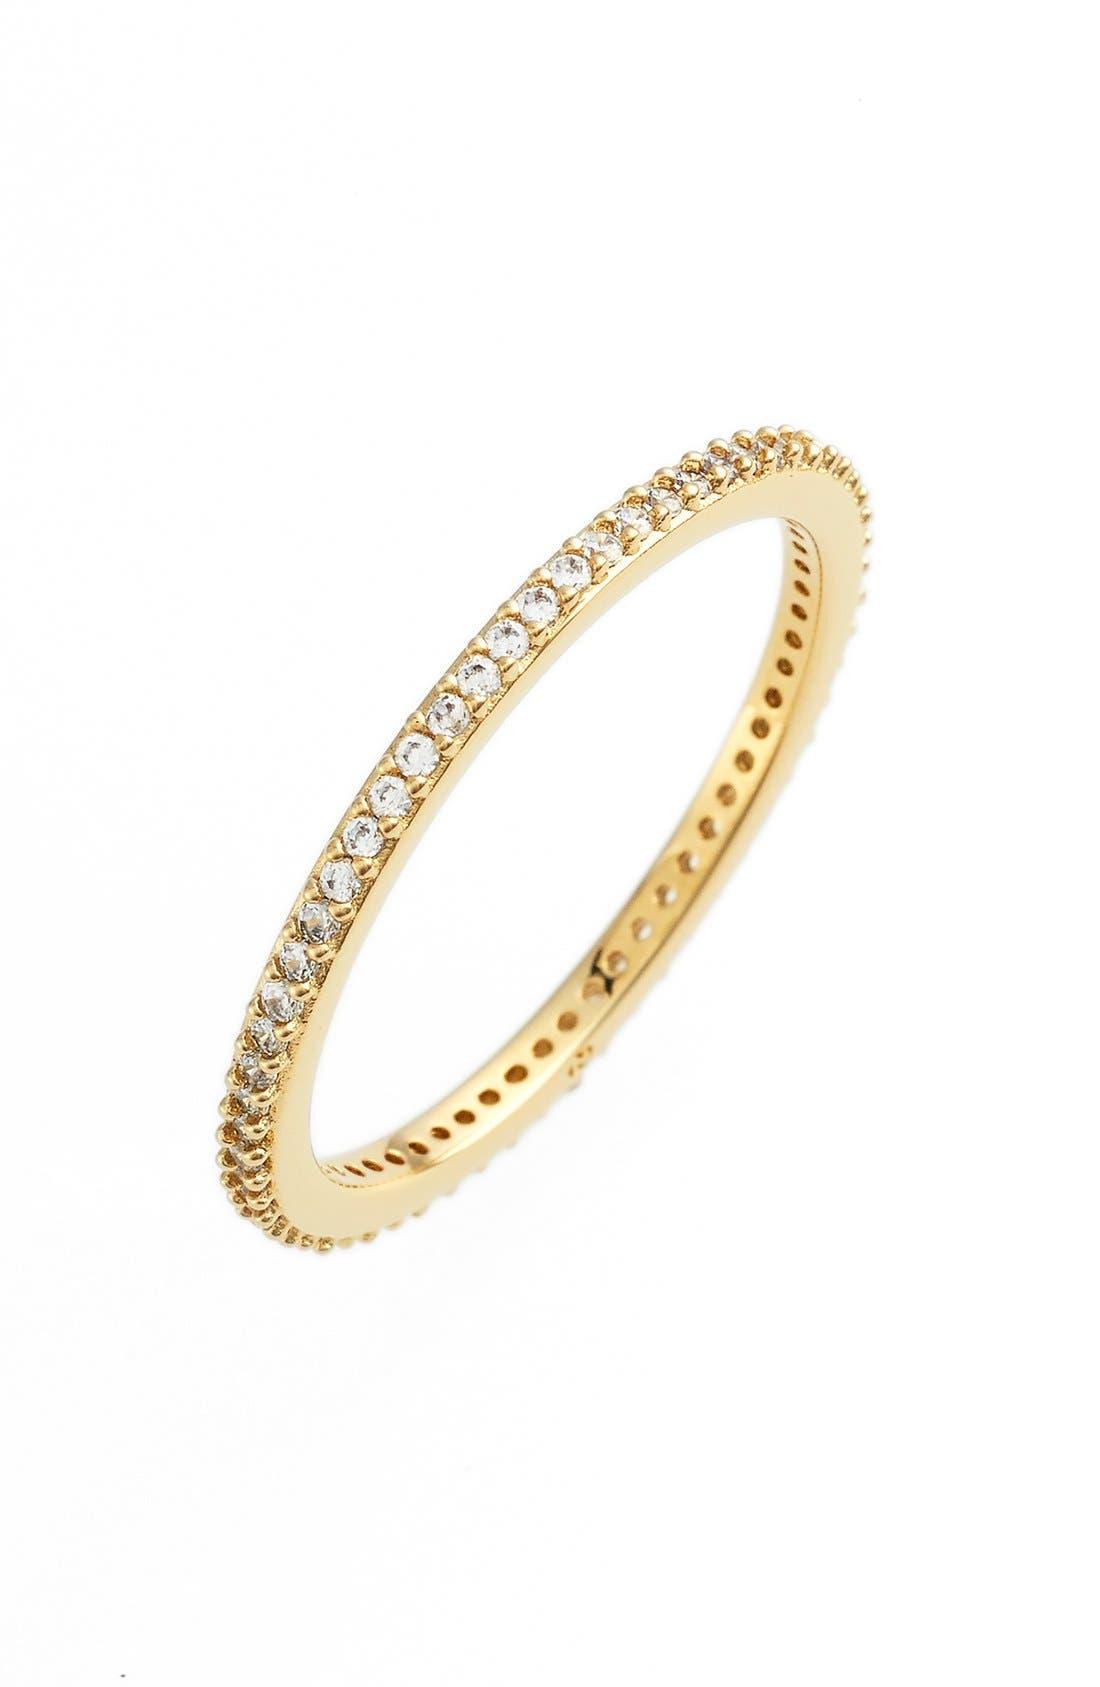 Main Image - Nadri Skinny Cubic Zirconia Pavé Band Ring